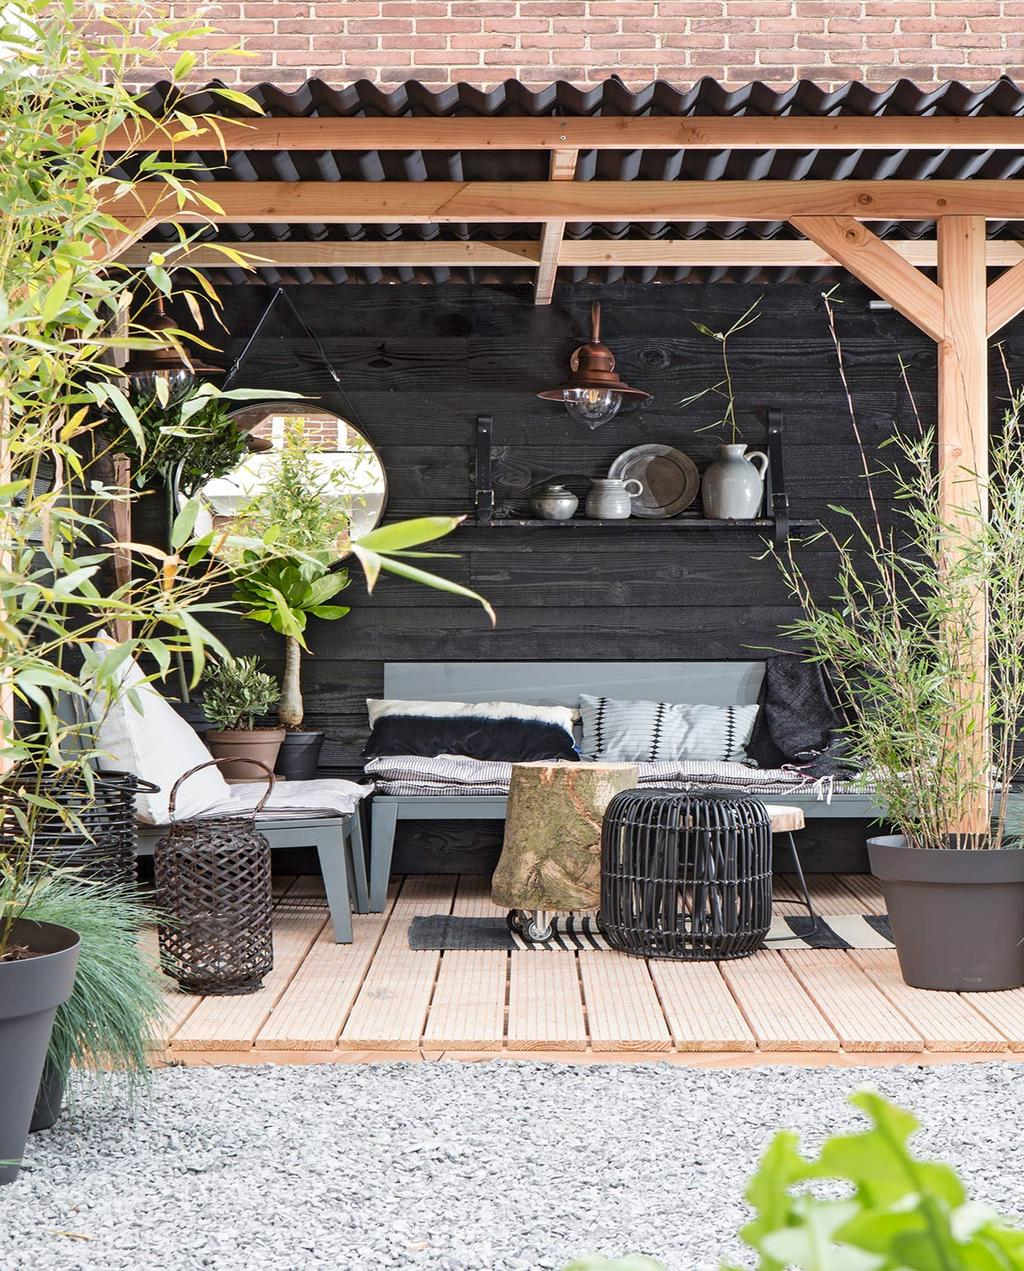 tuin-veranda-schutting-erfafscheiding-overkapping-tuinmeubel-vtwonen